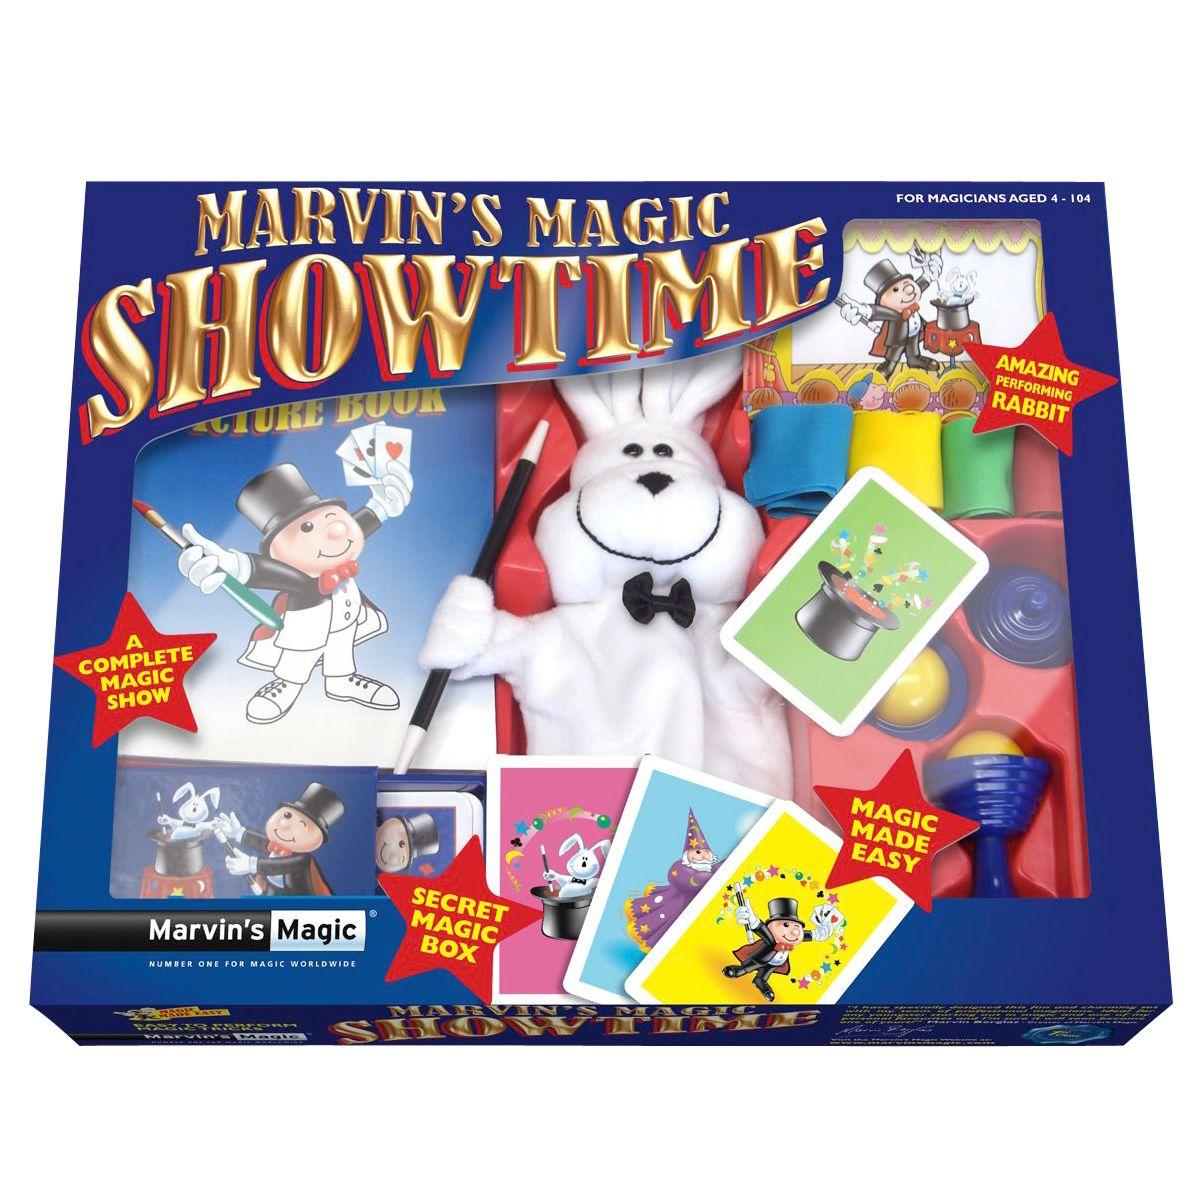 Marvin's Magic Marvin's Magic: Showtime